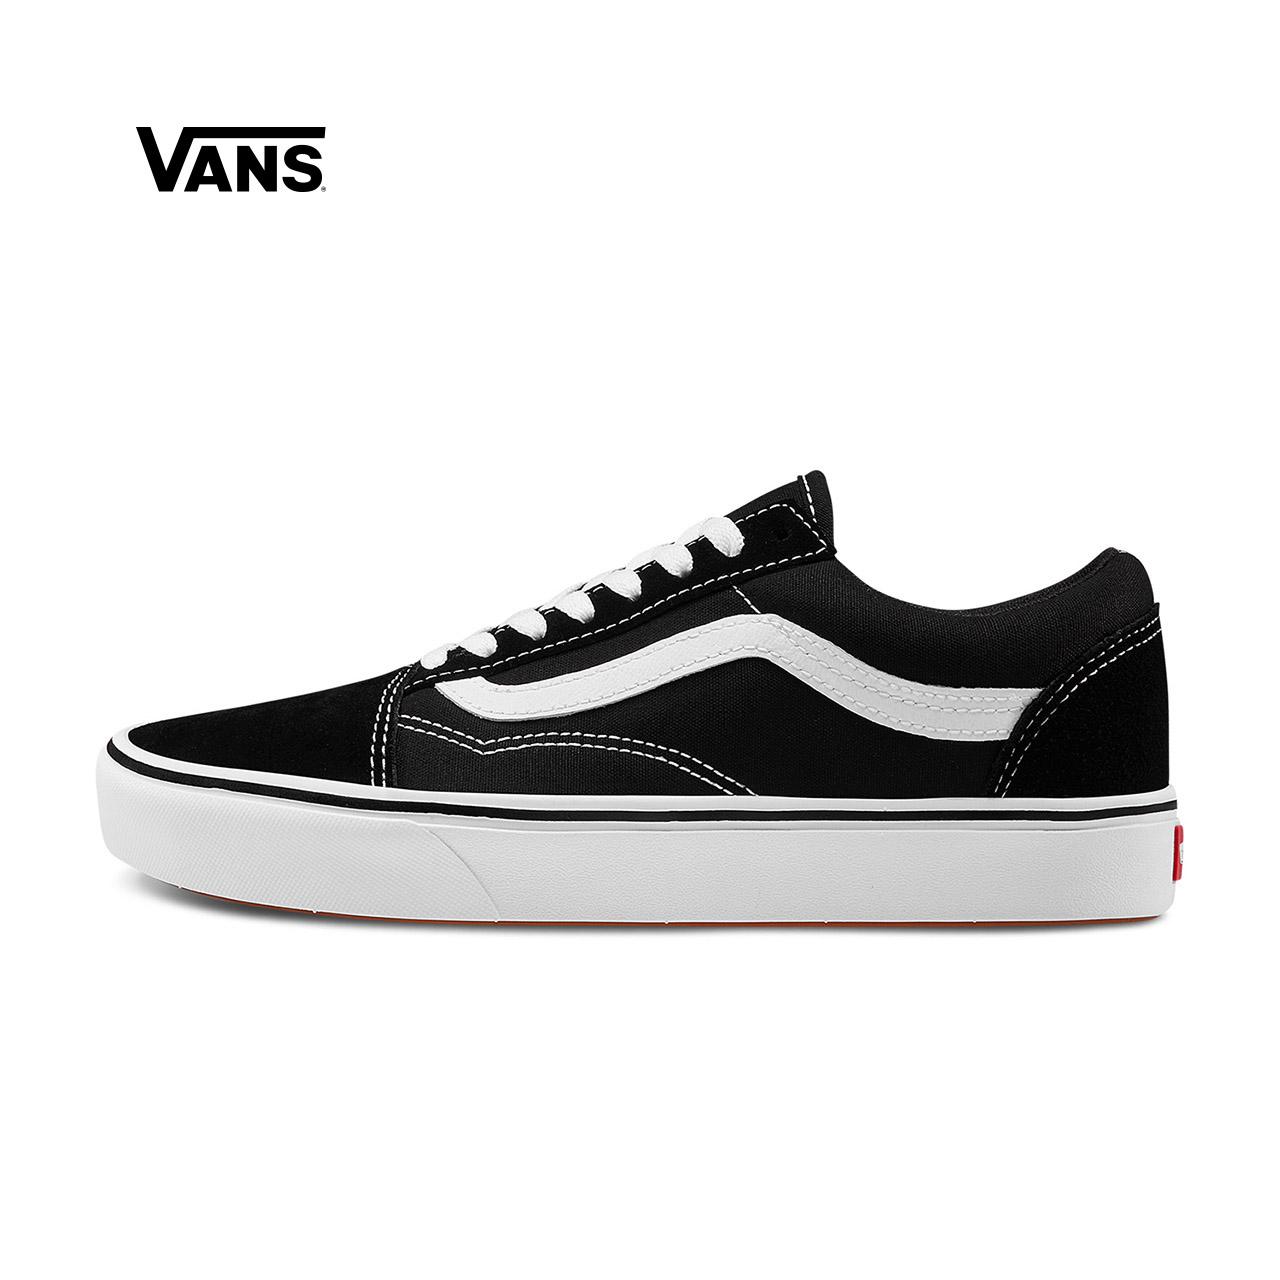 【暖春】Vans范斯 经典系列 Old Skool板鞋 ComfyCush正品 thumbnail